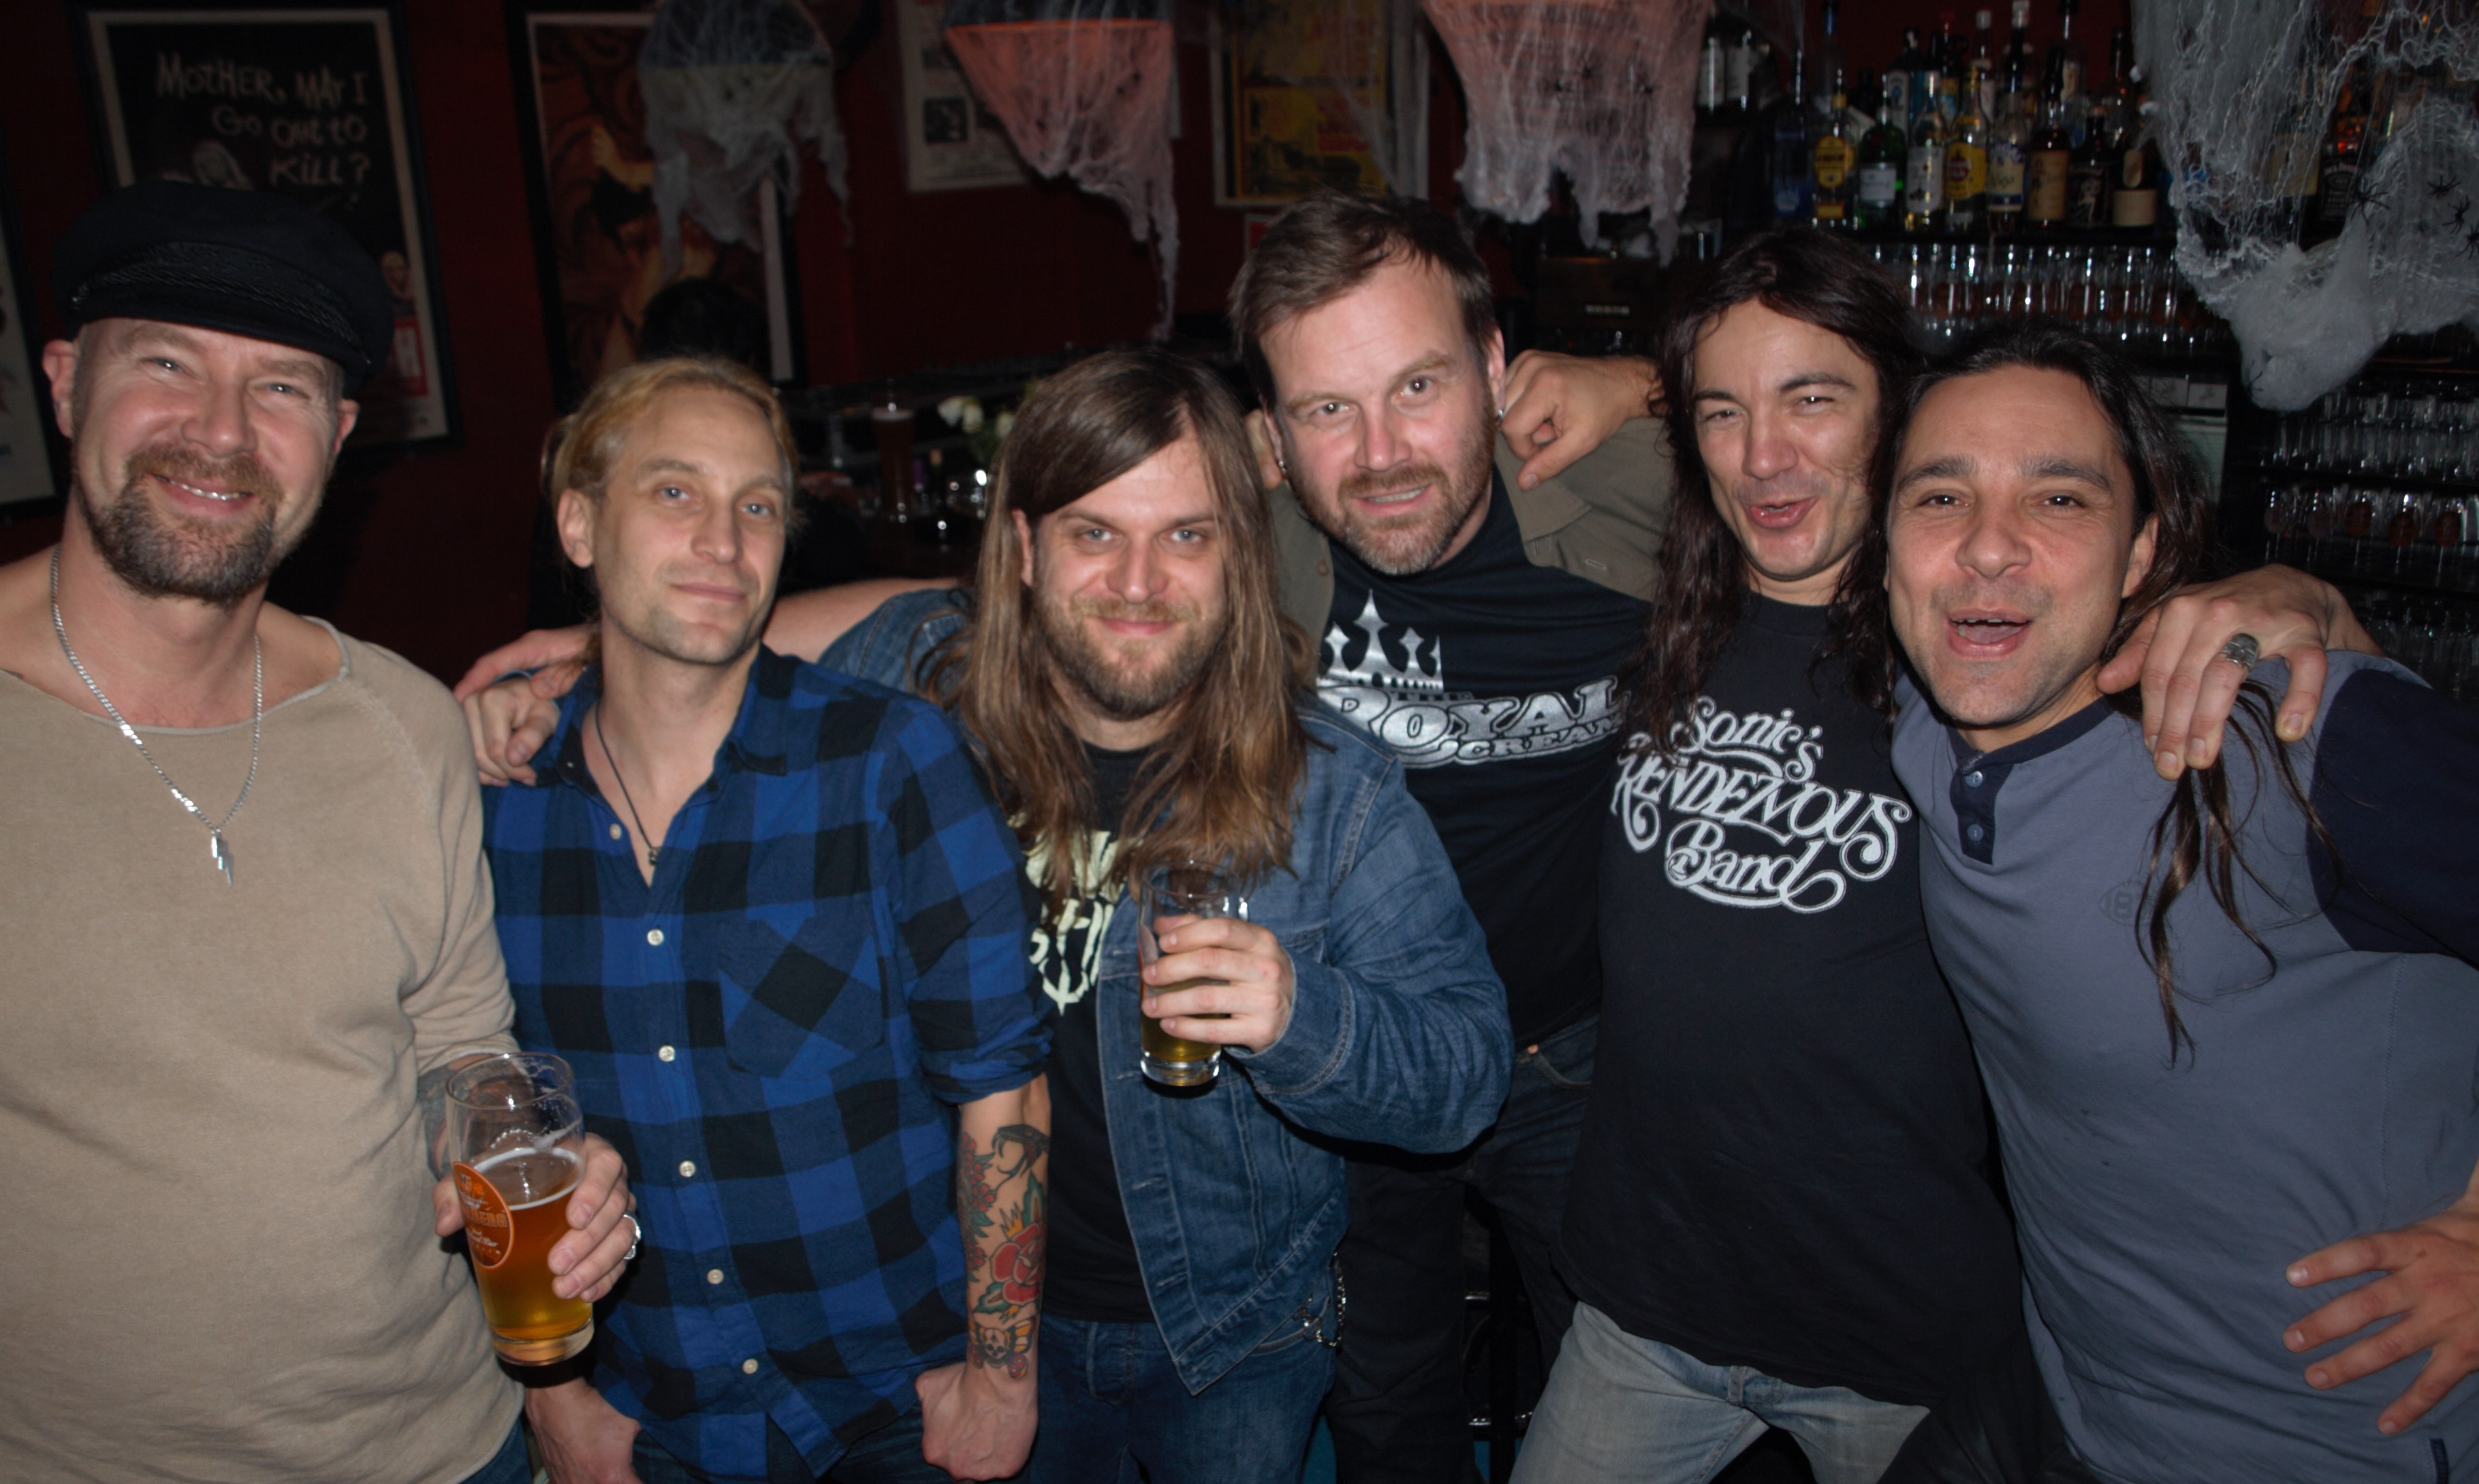 Packe, Andreas, Metal Hammer-Autor Ben, Mattias, Kurt und Tero.